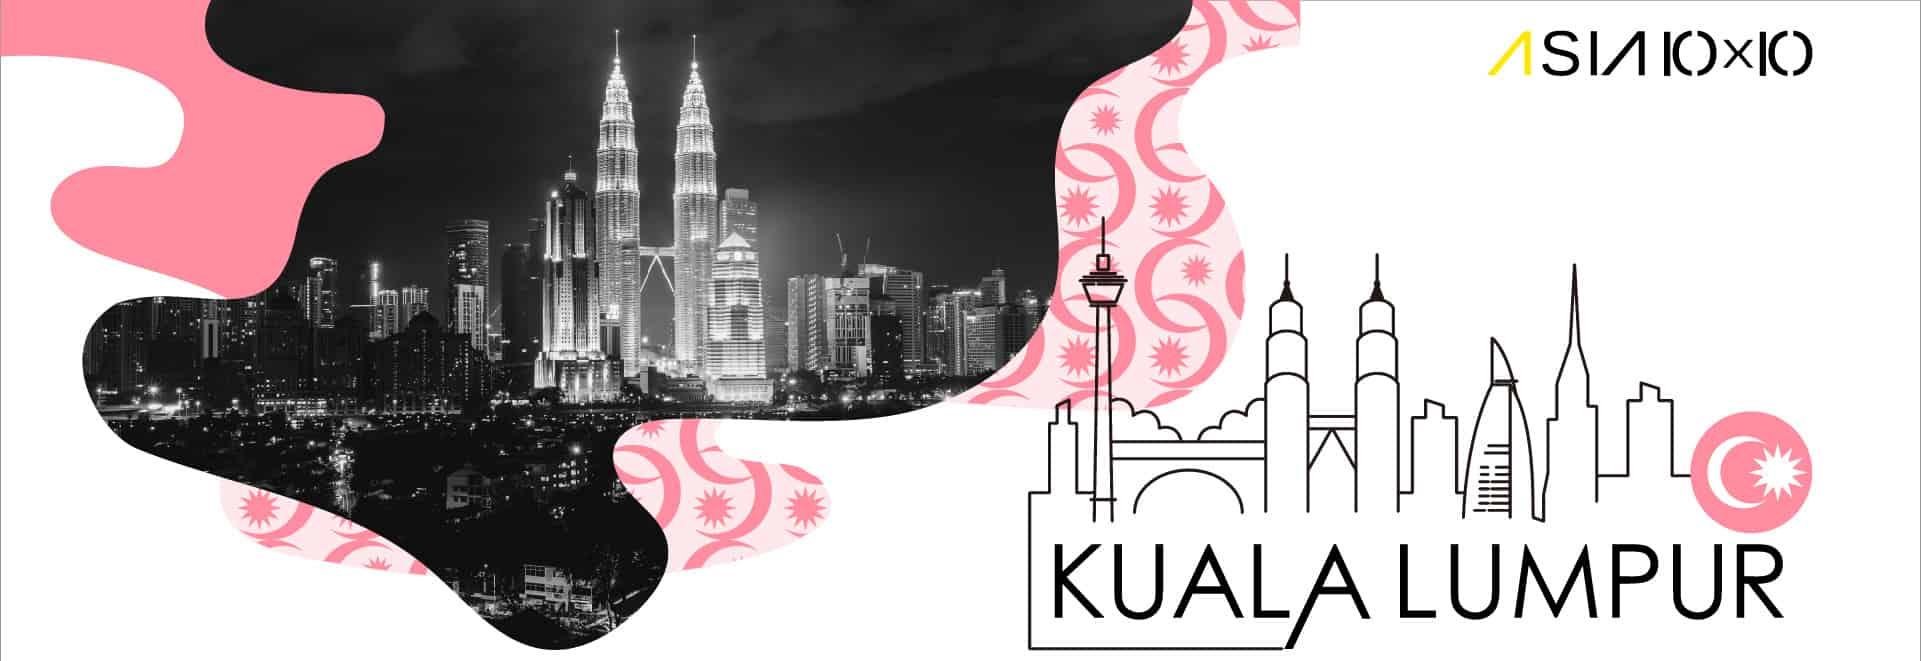 bg-asia1010-Kuala-Lumpur